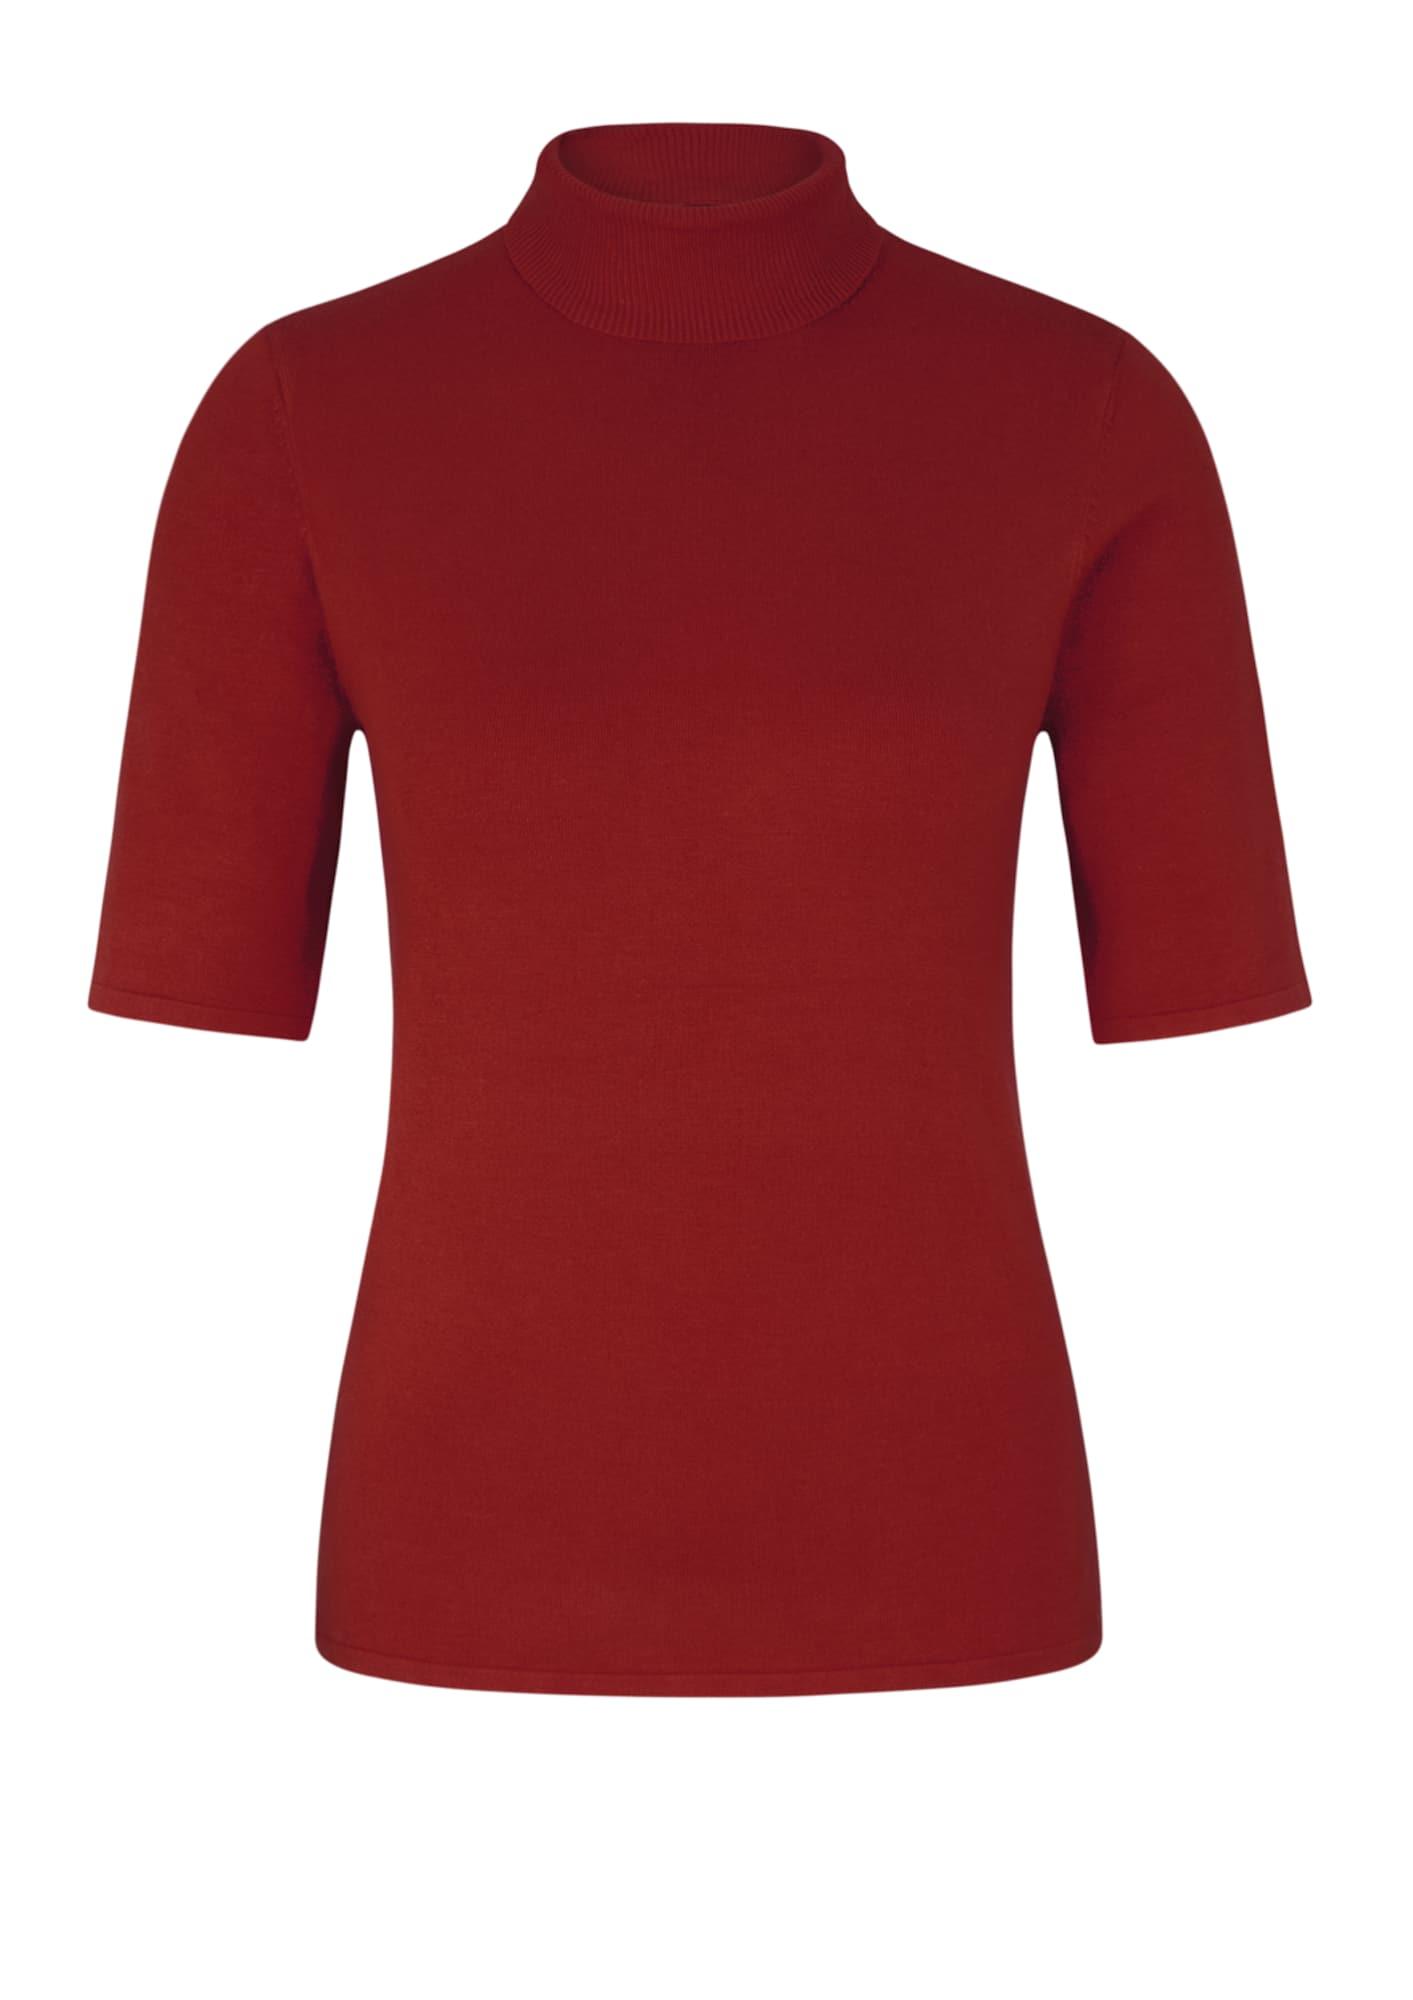 Kurzarmpullover | Bekleidung > Pullover > Kurzarmpullover | S.Oliver BLACK LABEL